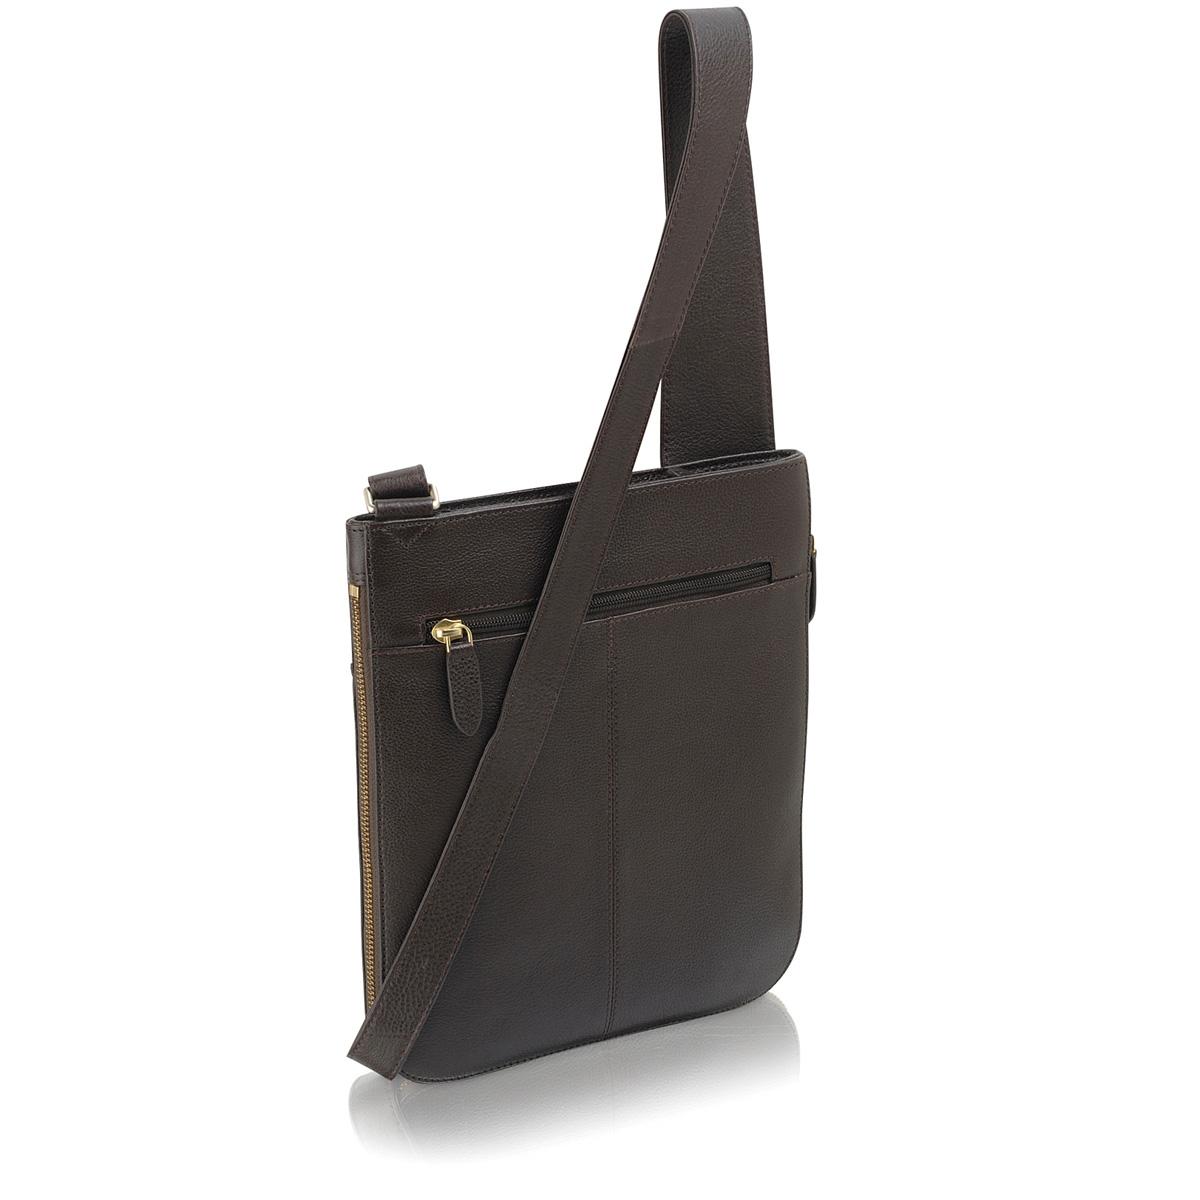 99153794a19e Radley Pockets Medium Zip Top Cross Body Bag | Jarrold, Norwich